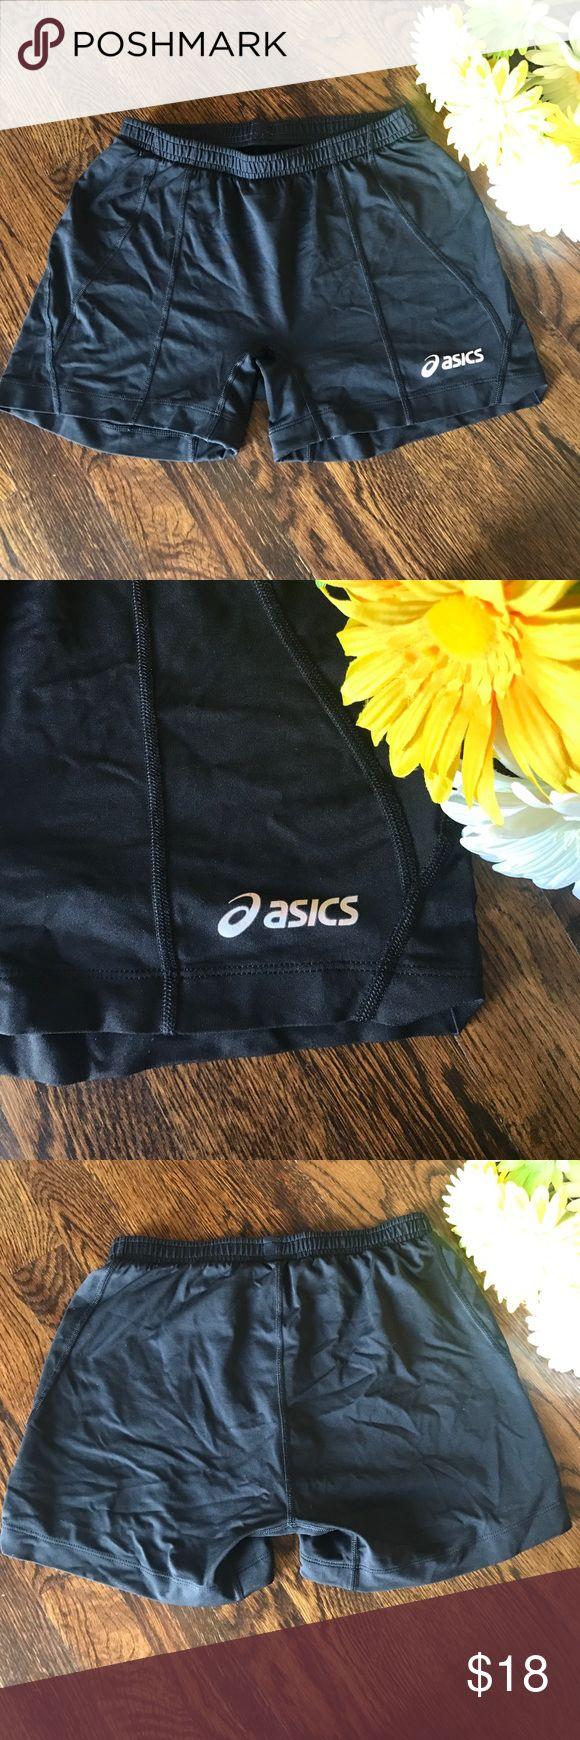 Asics Spandex Running Shorts, Sz M Black Asics spandex running shorts. Size Medium. Asics Shorts